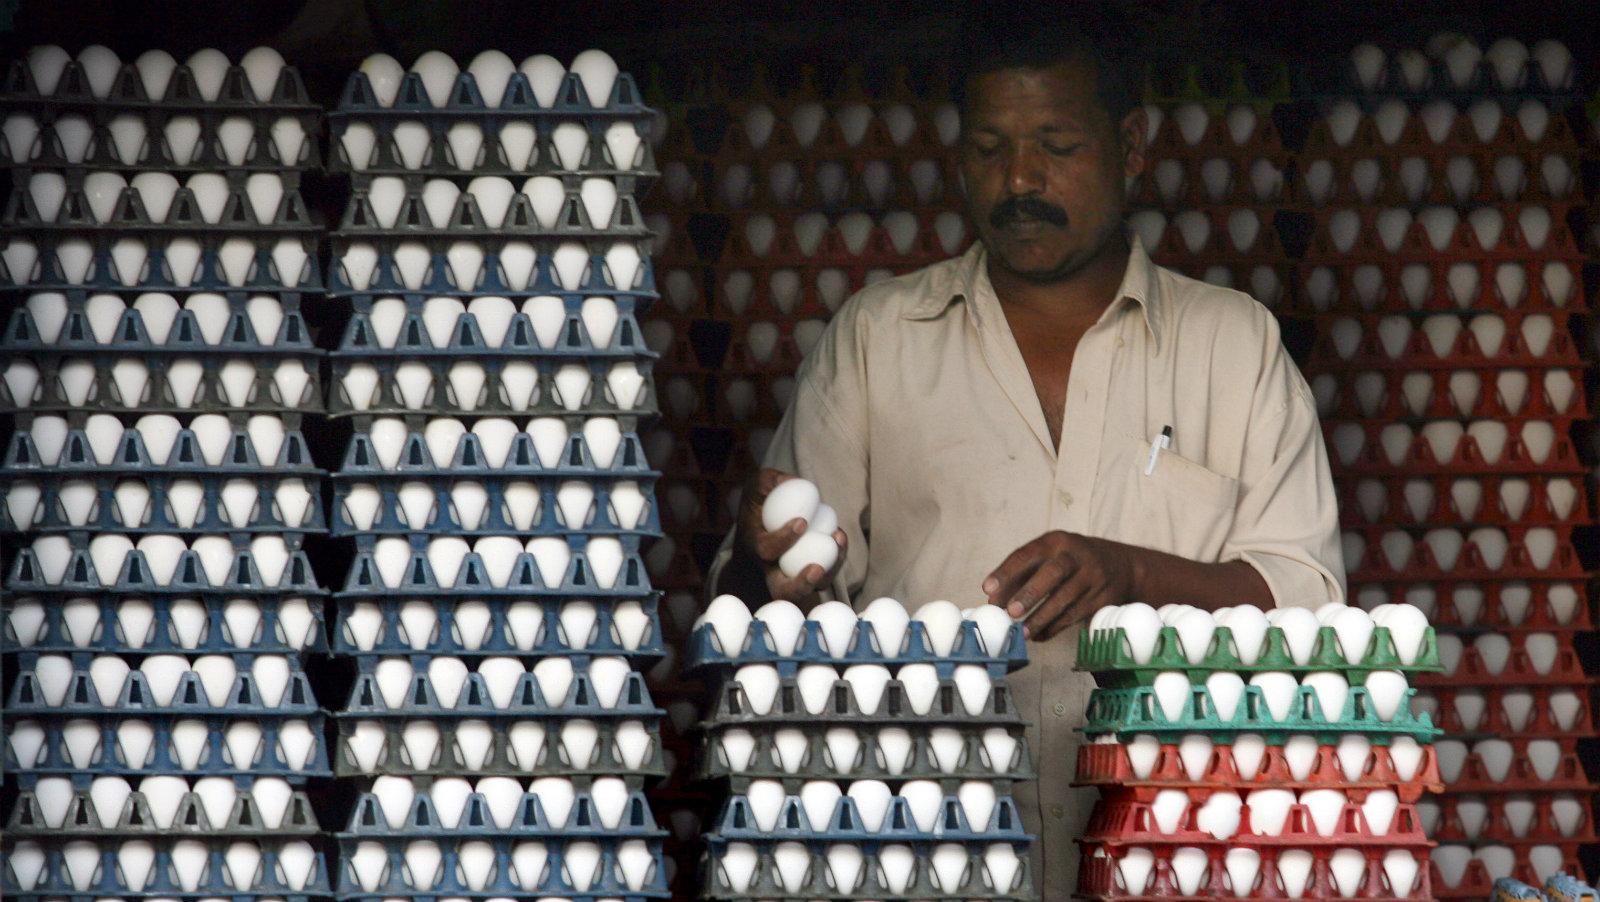 egg-india-inflation